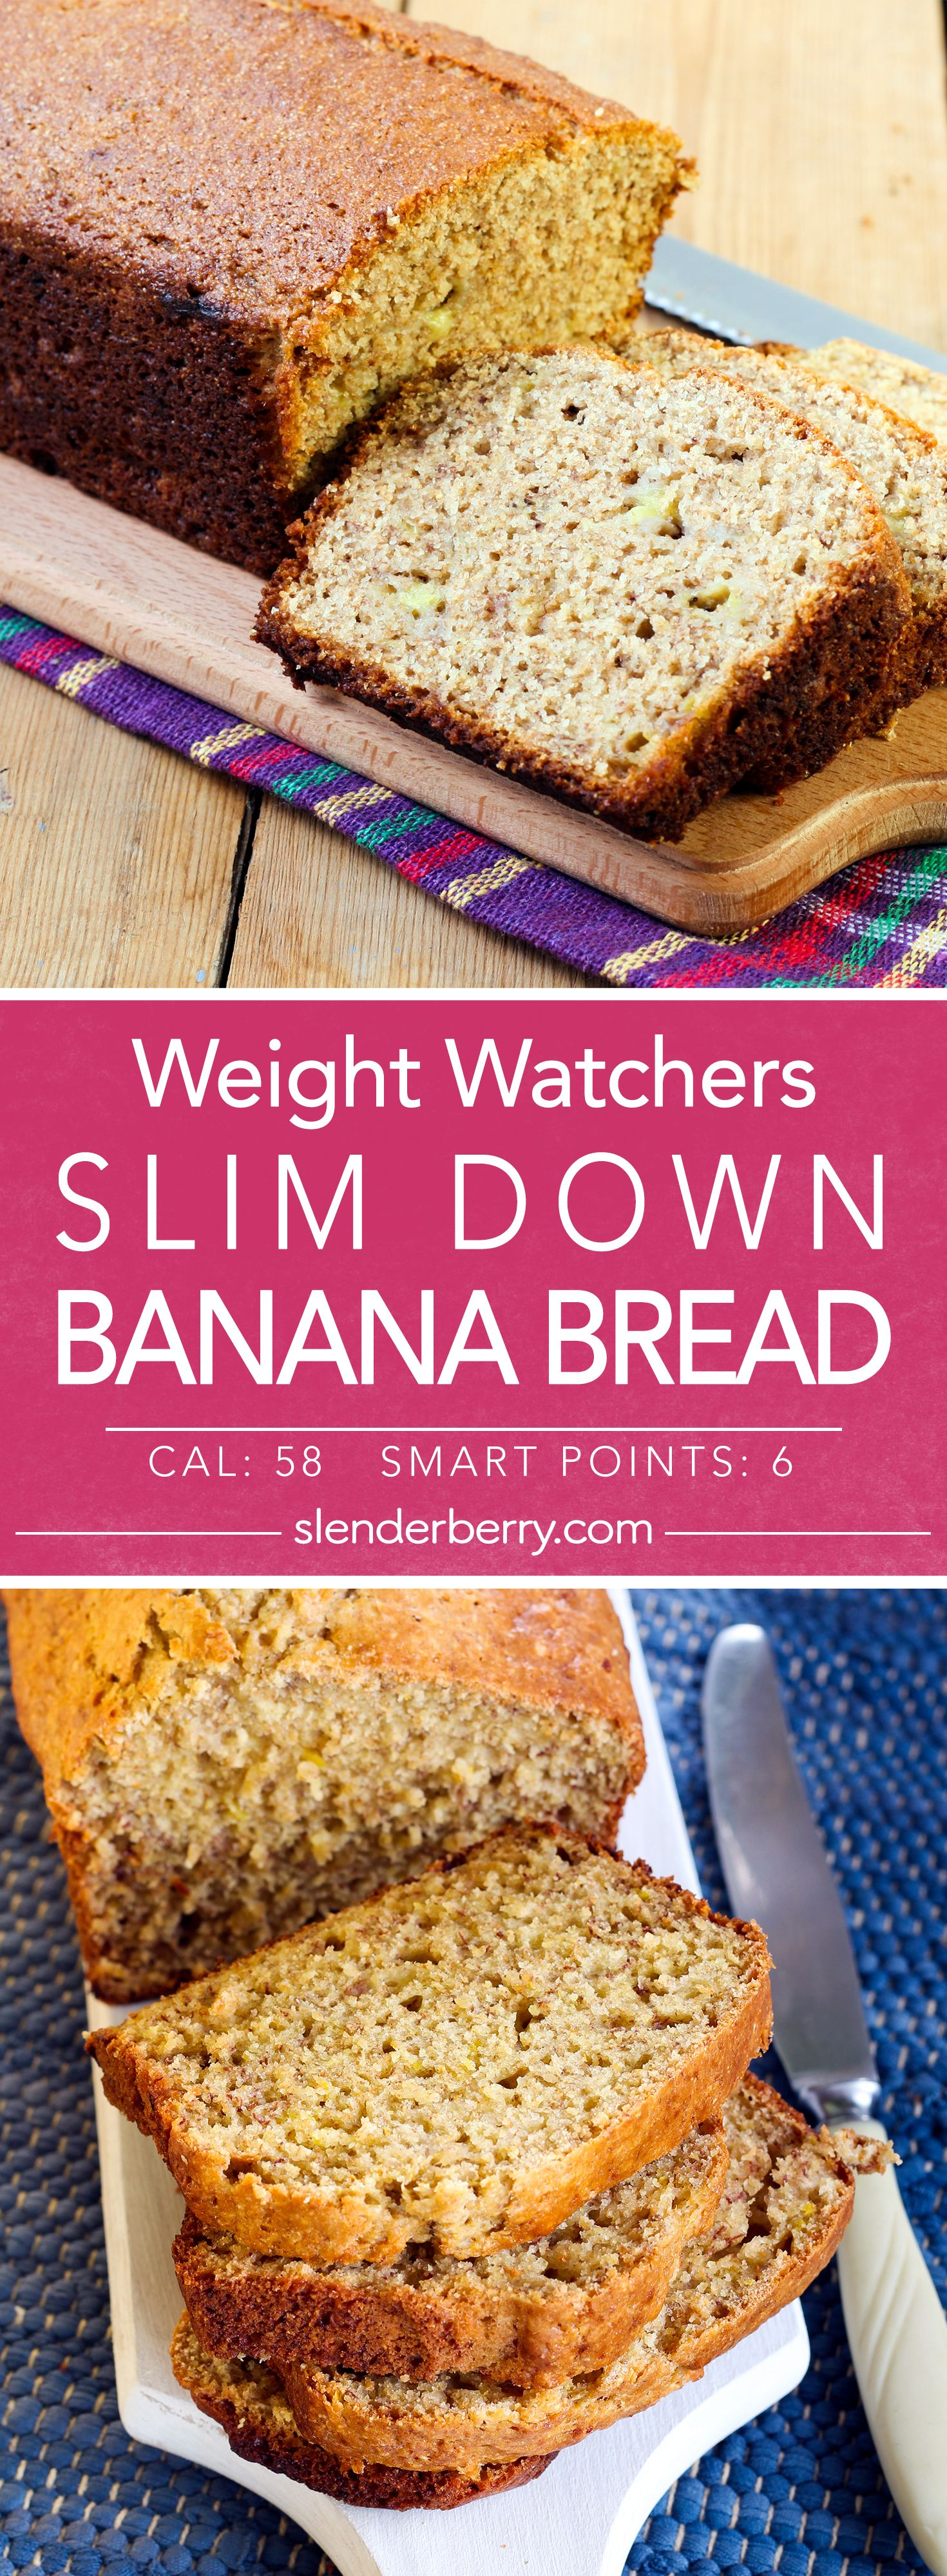 Slim Down Banana Bread Recipe Low Calorie Banana Bread